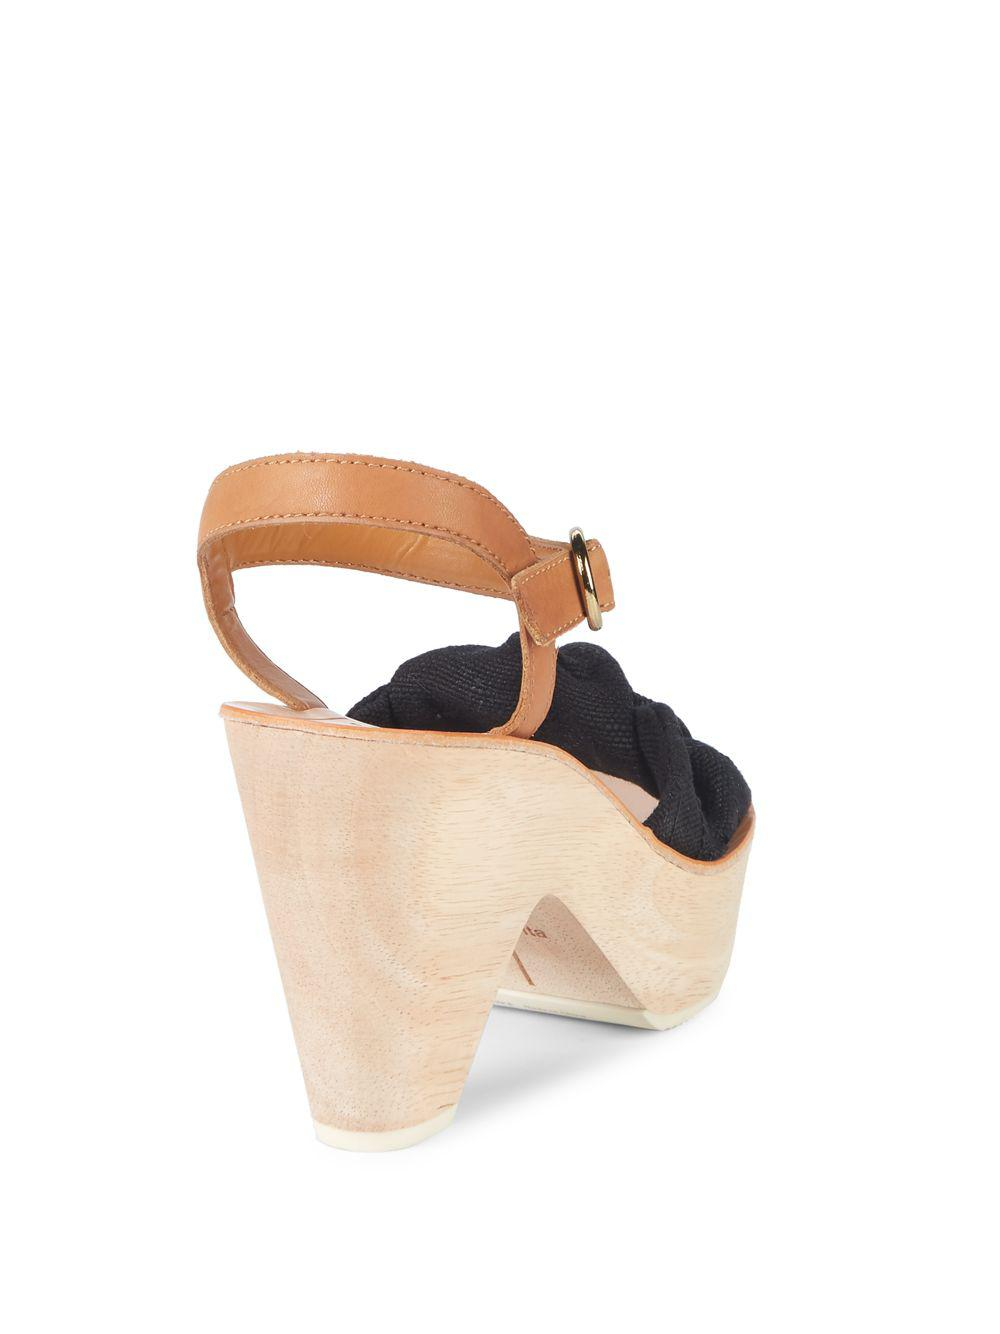 b88f43675fb Lyst - Dolce Vita Shia Knotted Sandals - Save 37%